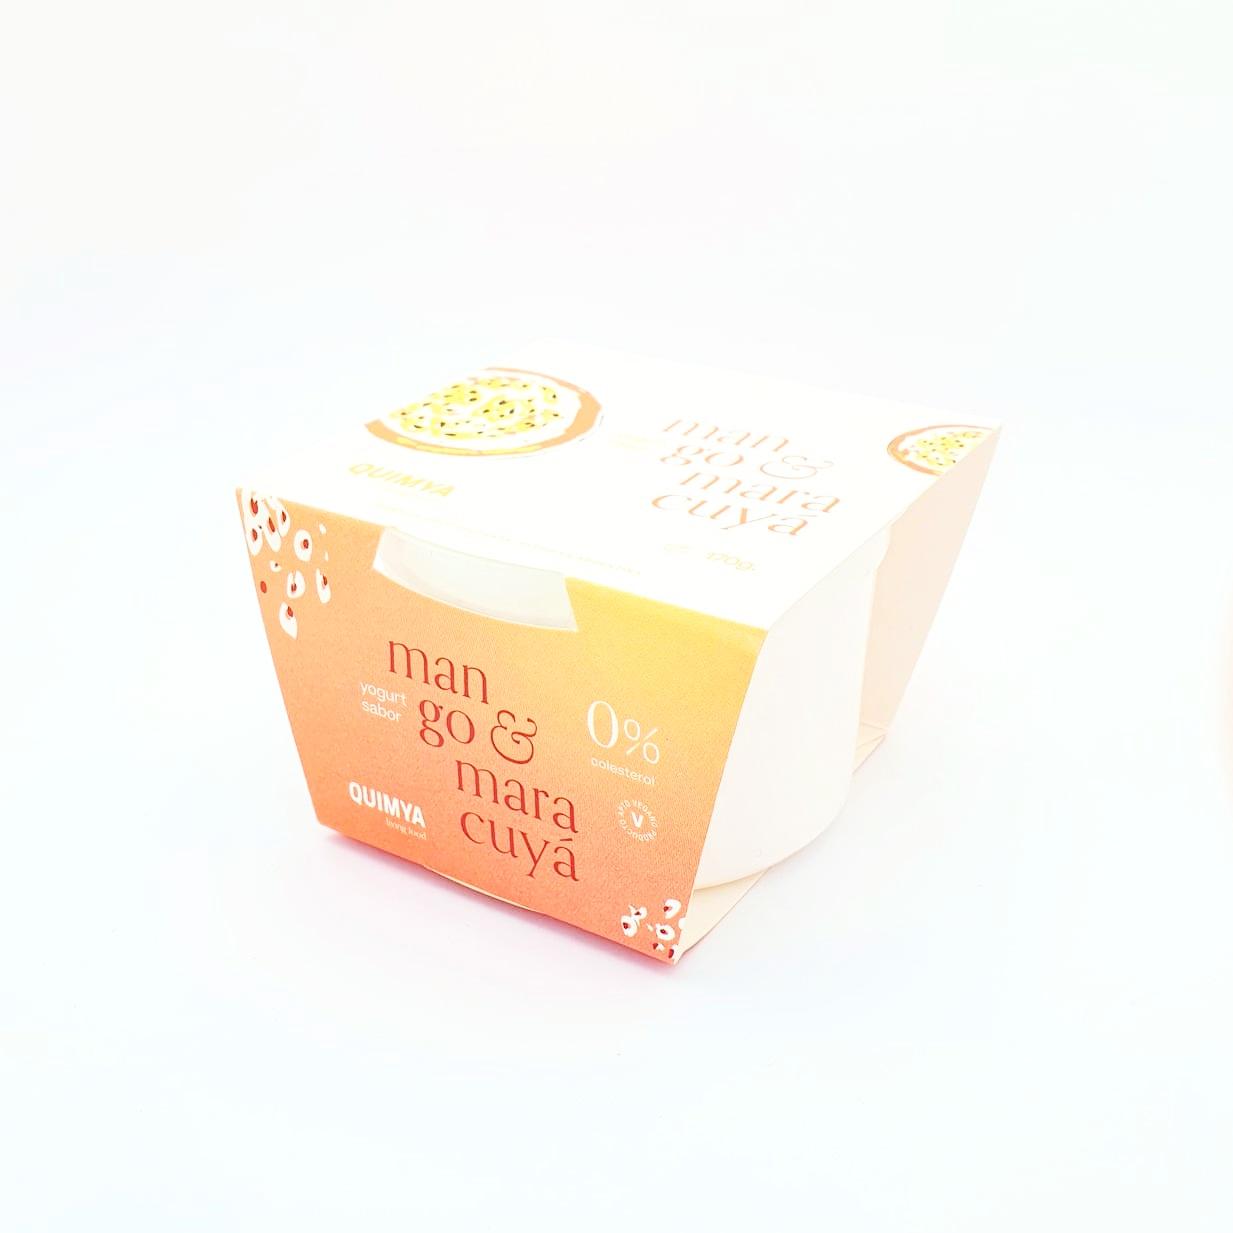 Yogur de coco sabor mango y maracuya